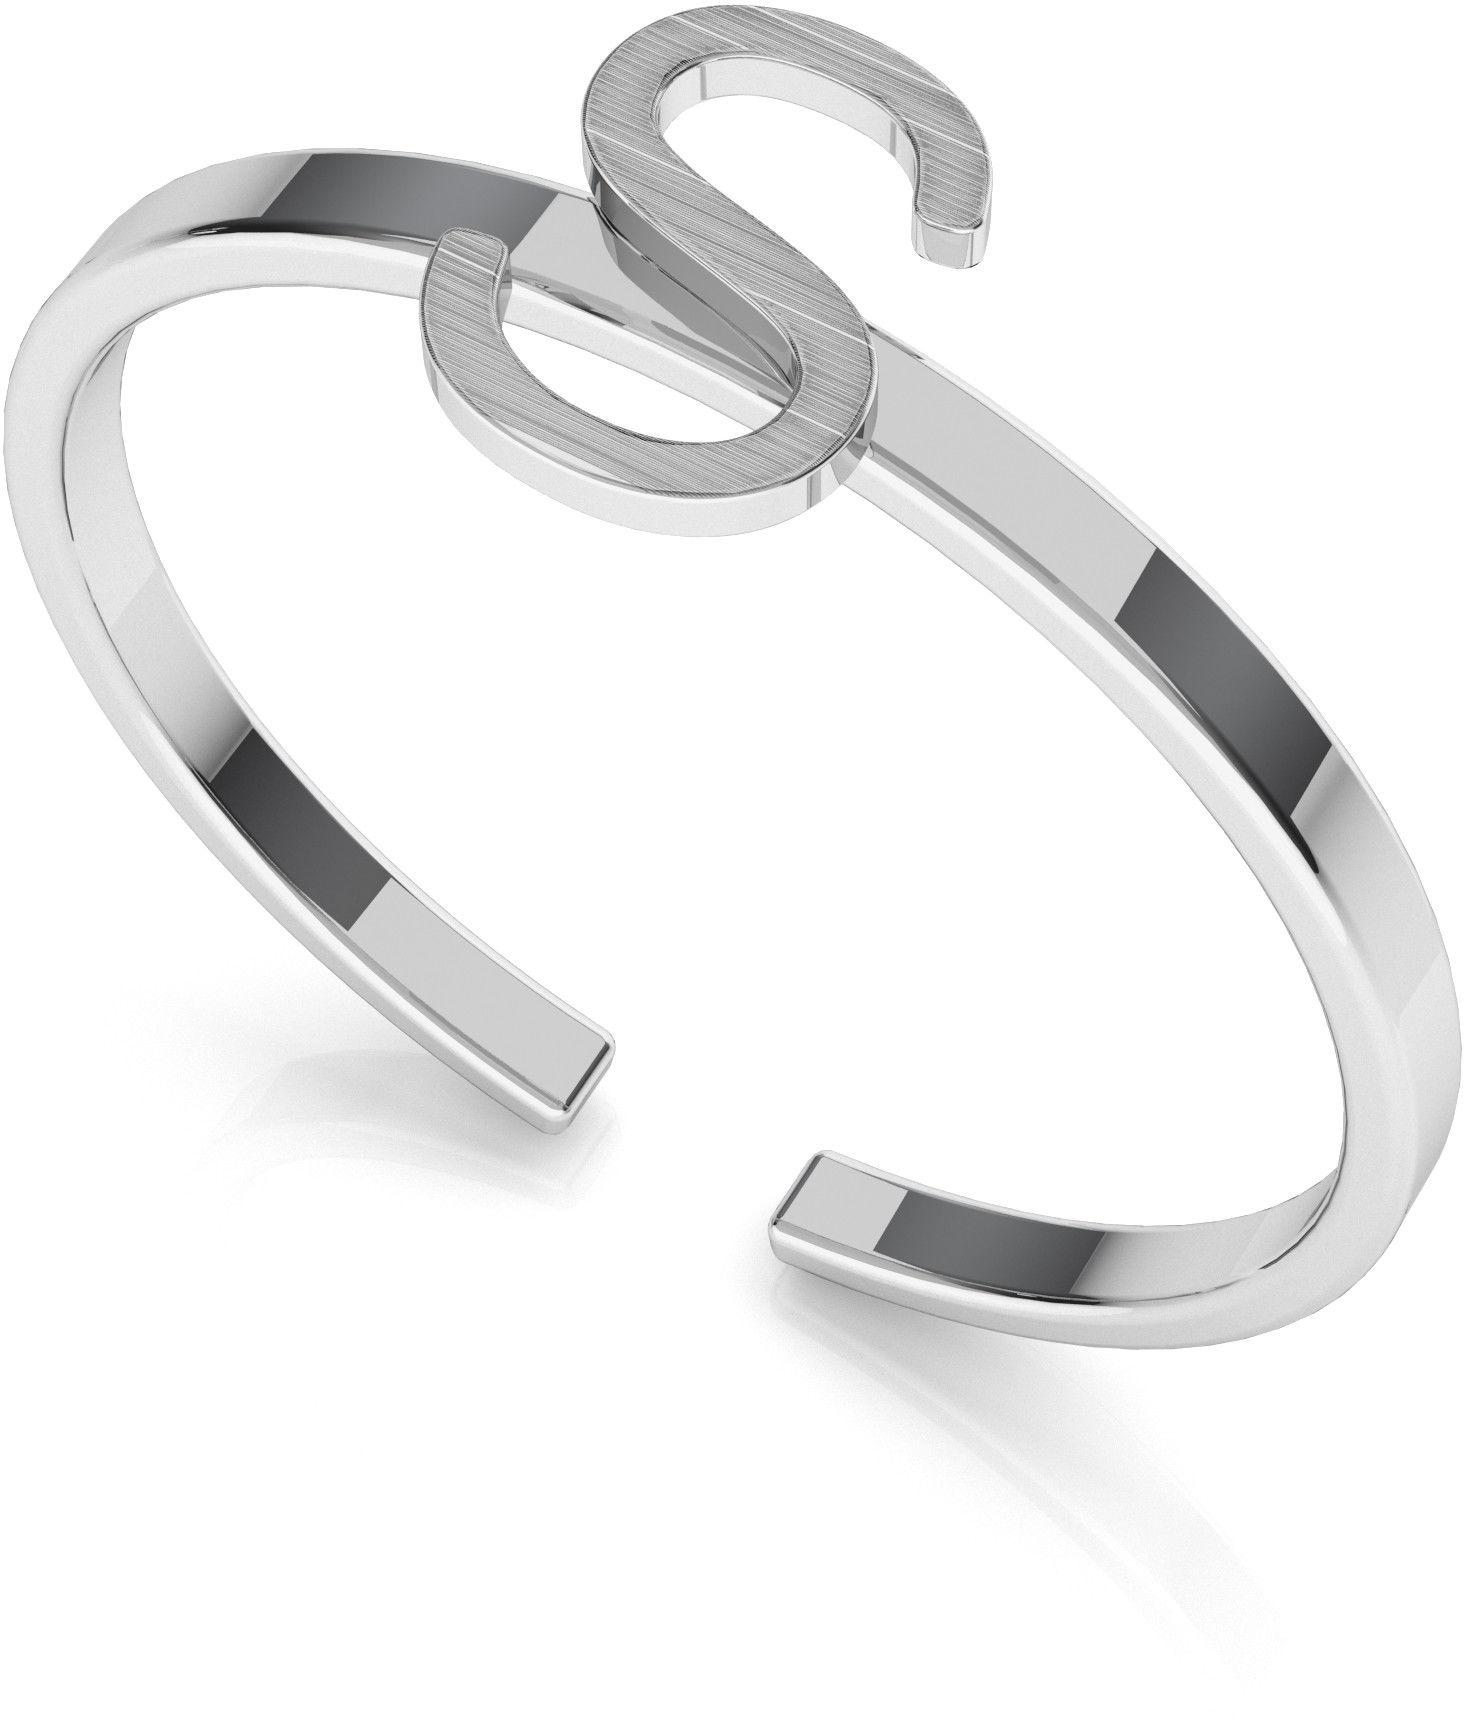 Srebrny pierścionek z literką My RING, srebro 925 : Litera - S, Srebro - kolor pokrycia - Pokrycie platyną